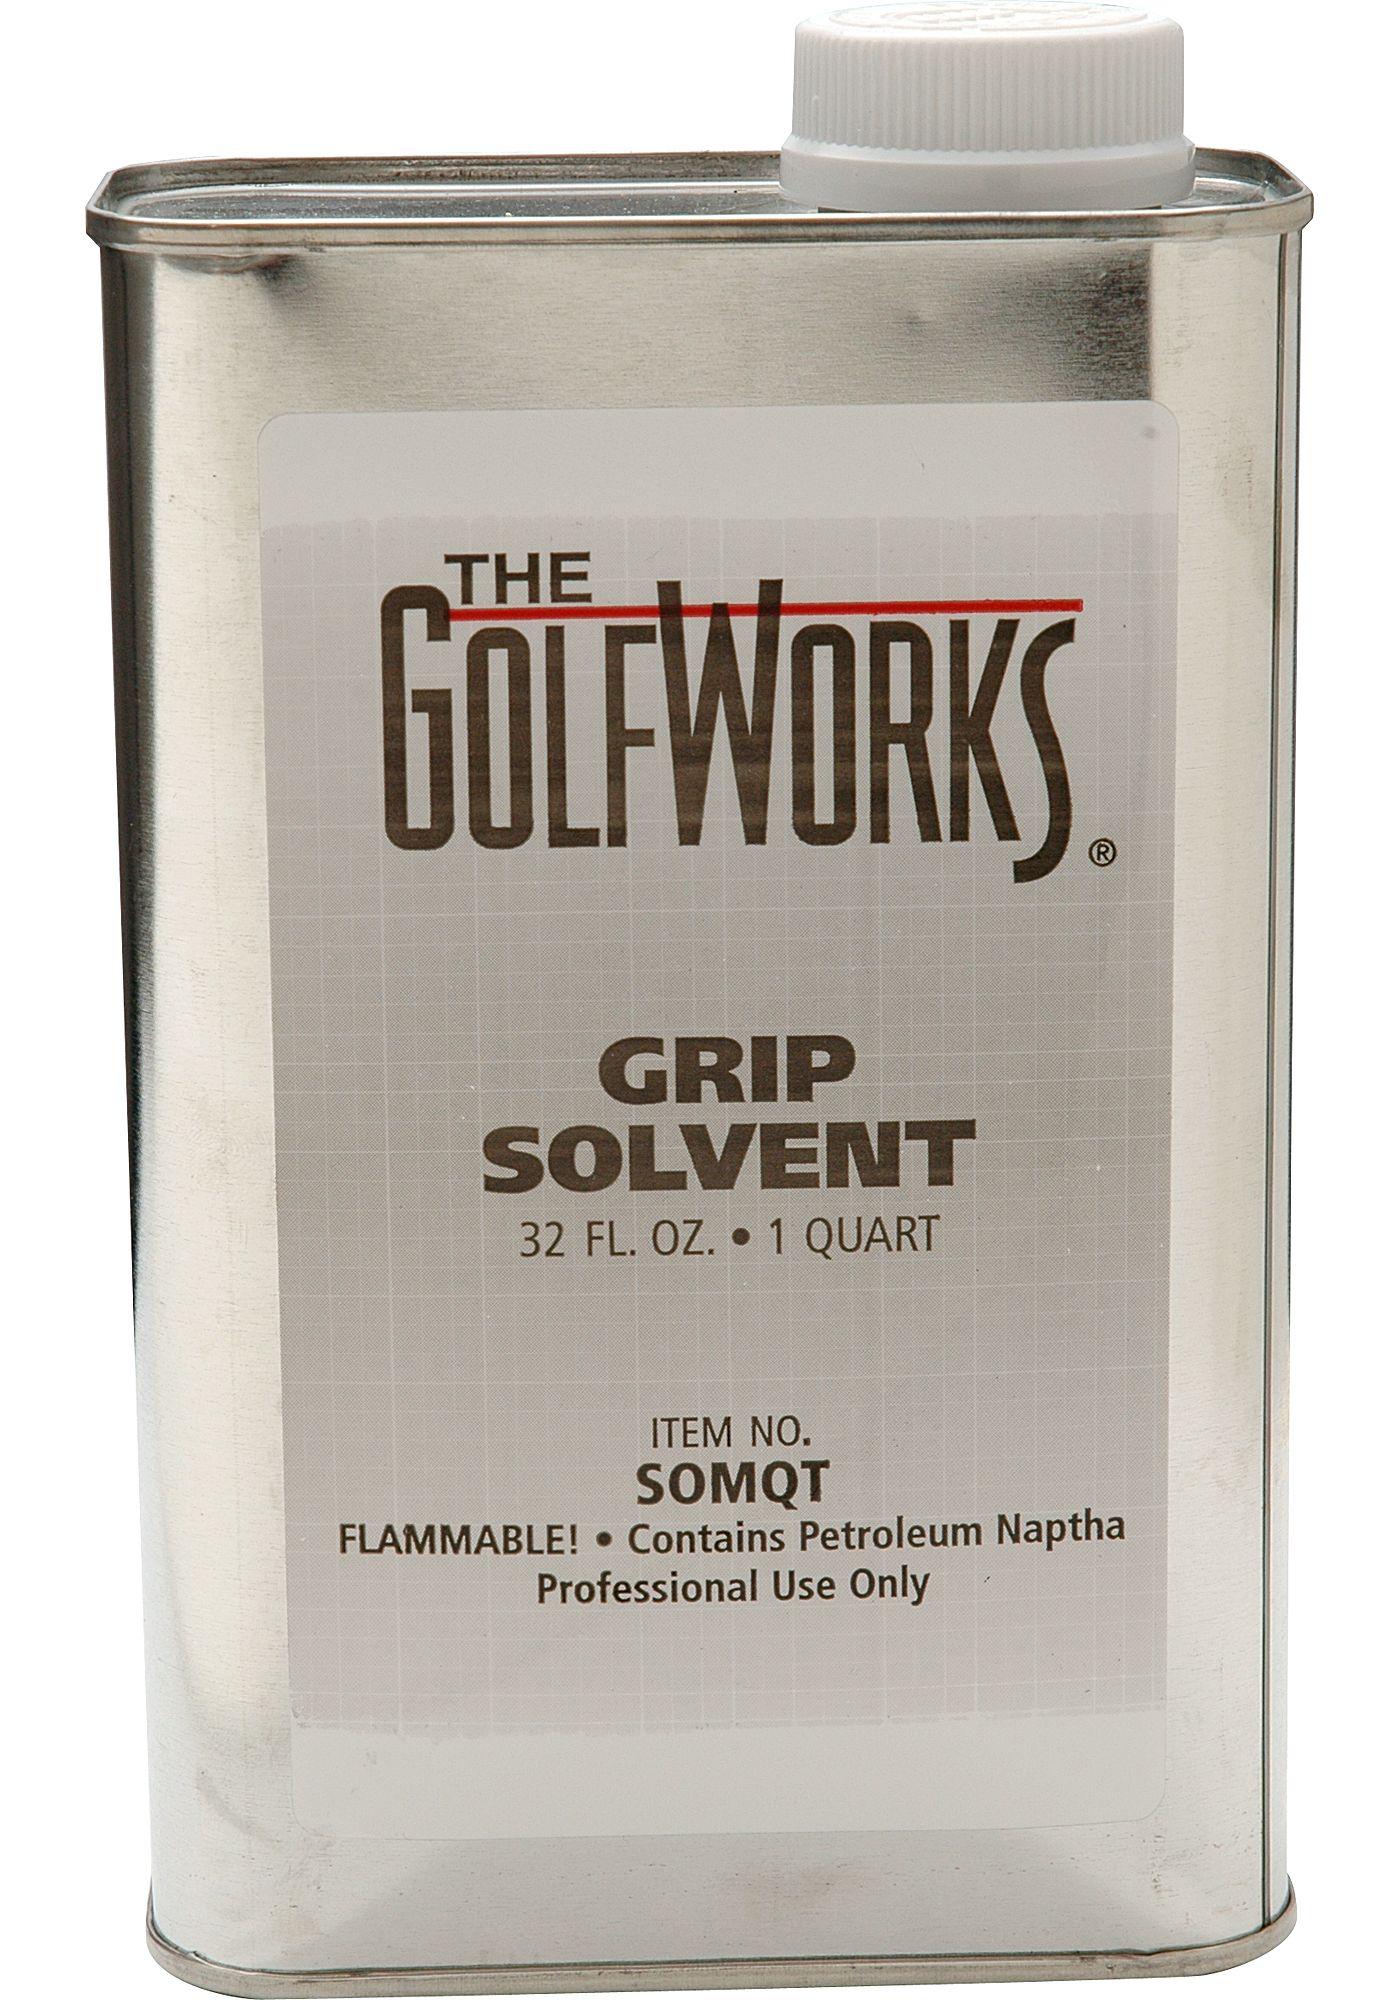 GolfWorks Grip Solvent